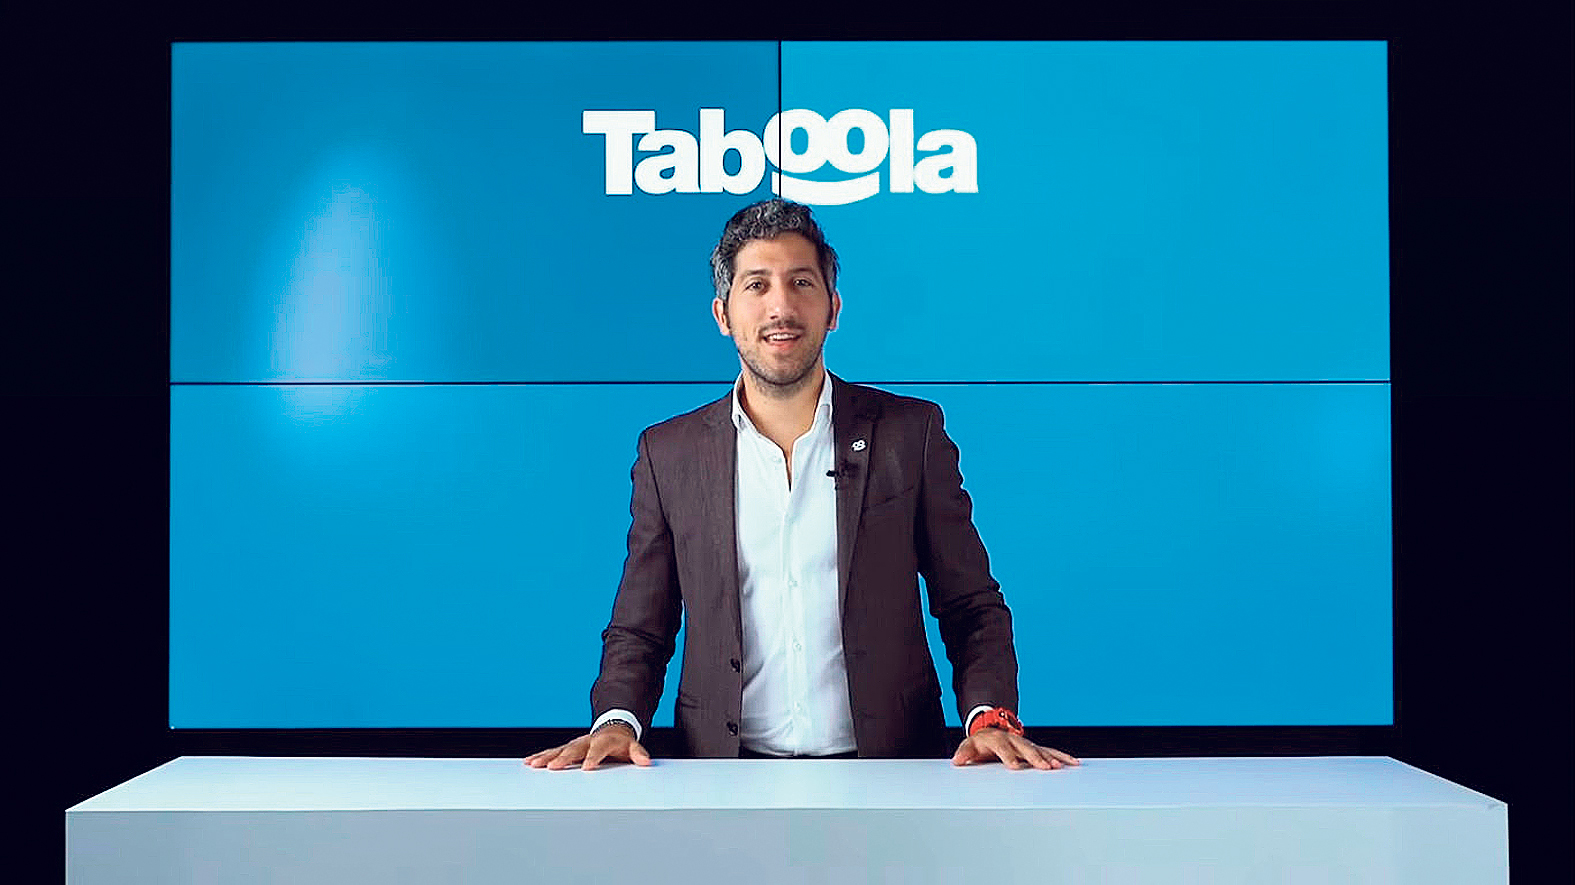 Taboola CEO Adam Singolda. Photo: YouTube